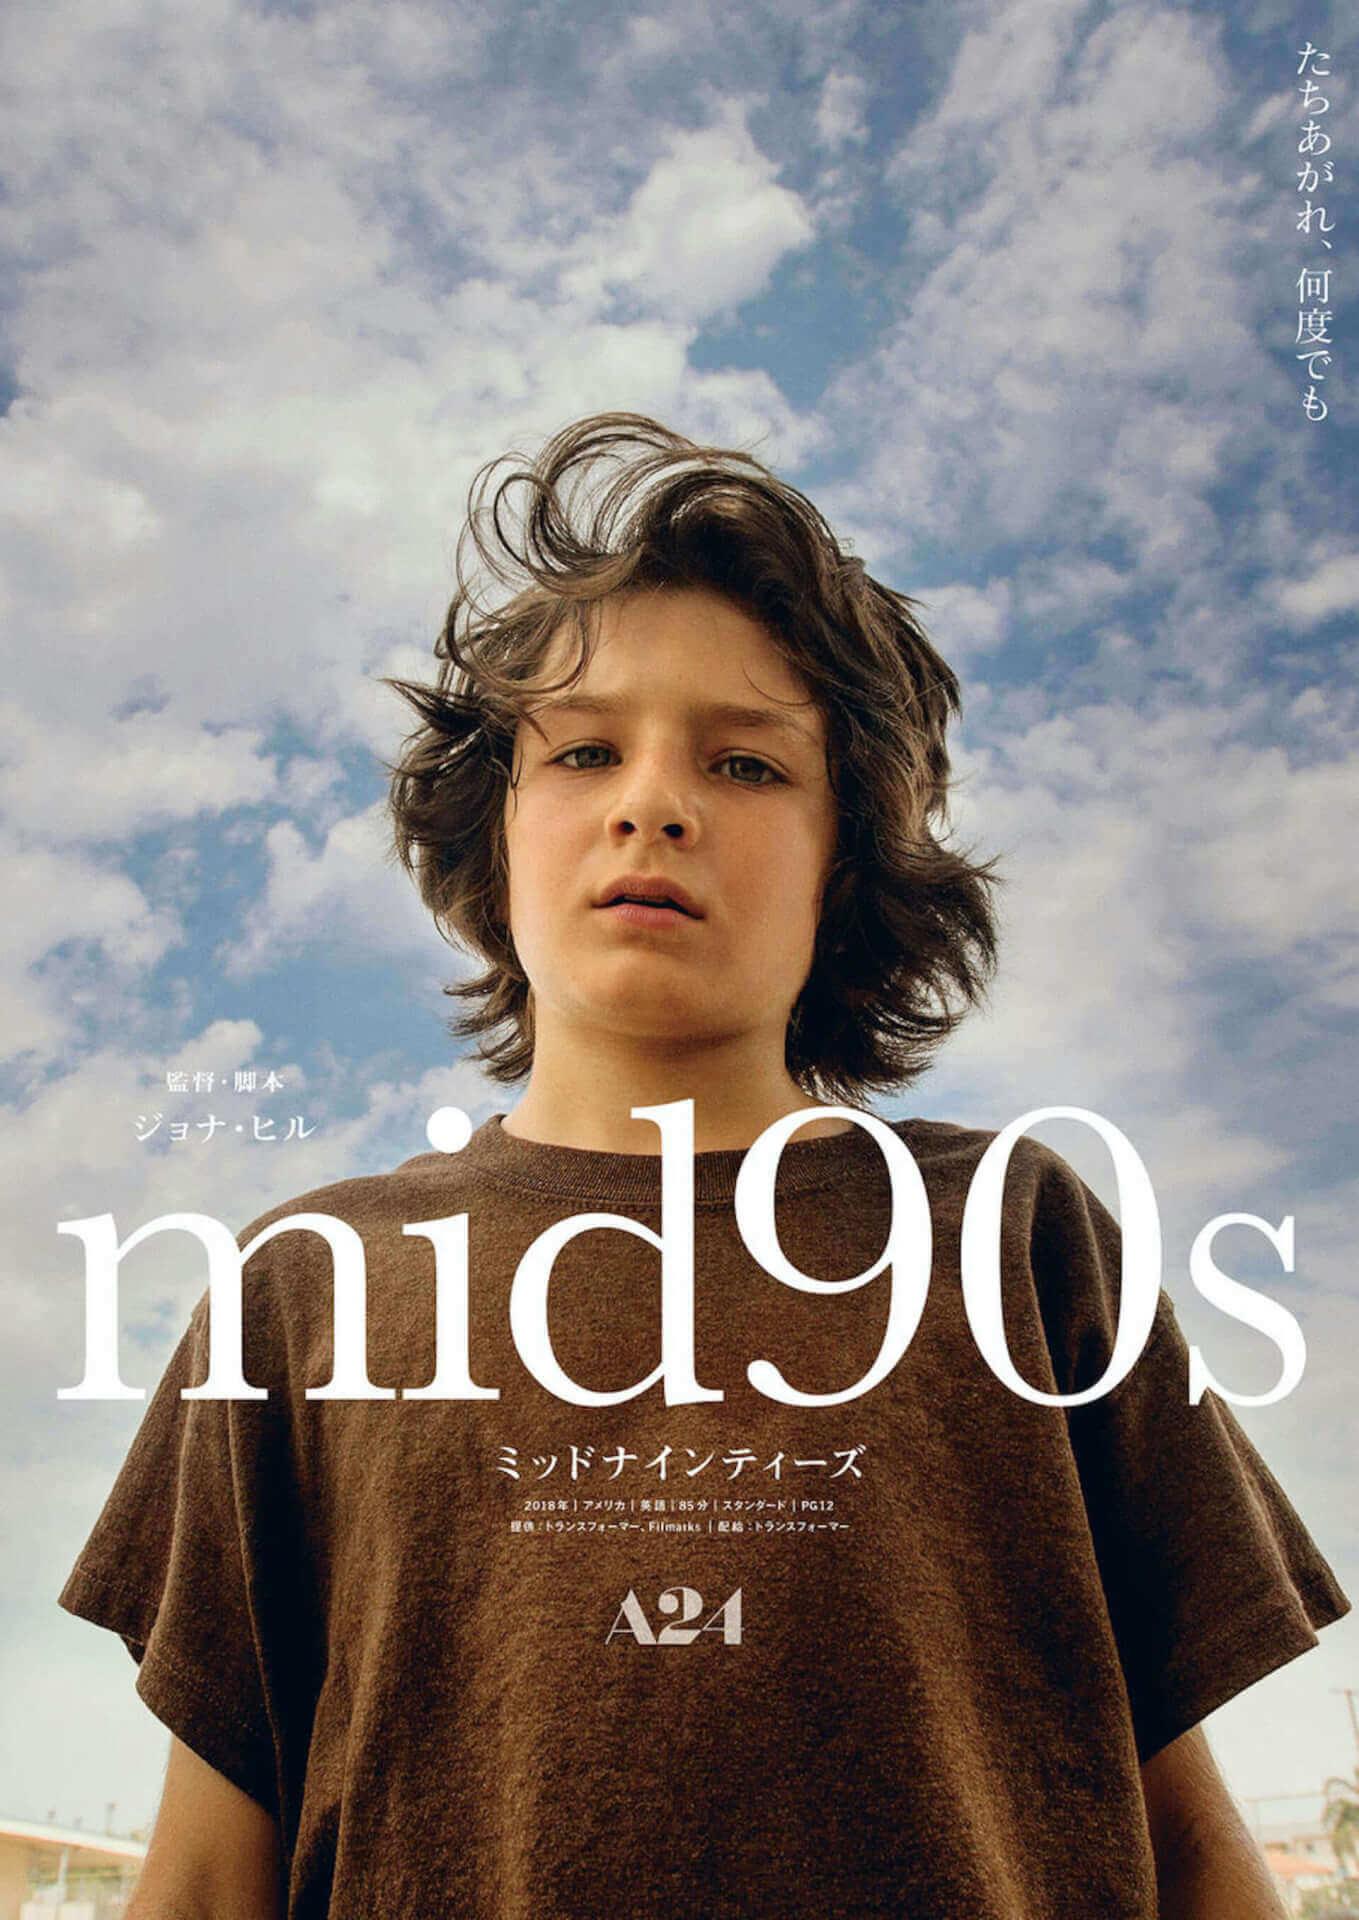 A24最新作『mid90s ミッドナインティーズ』が大ヒットスタートで拡大公開決定!ジョナ・ヒル監督が映画への想いを語った特別メイキング映像も公開 film200904_mid90s_1